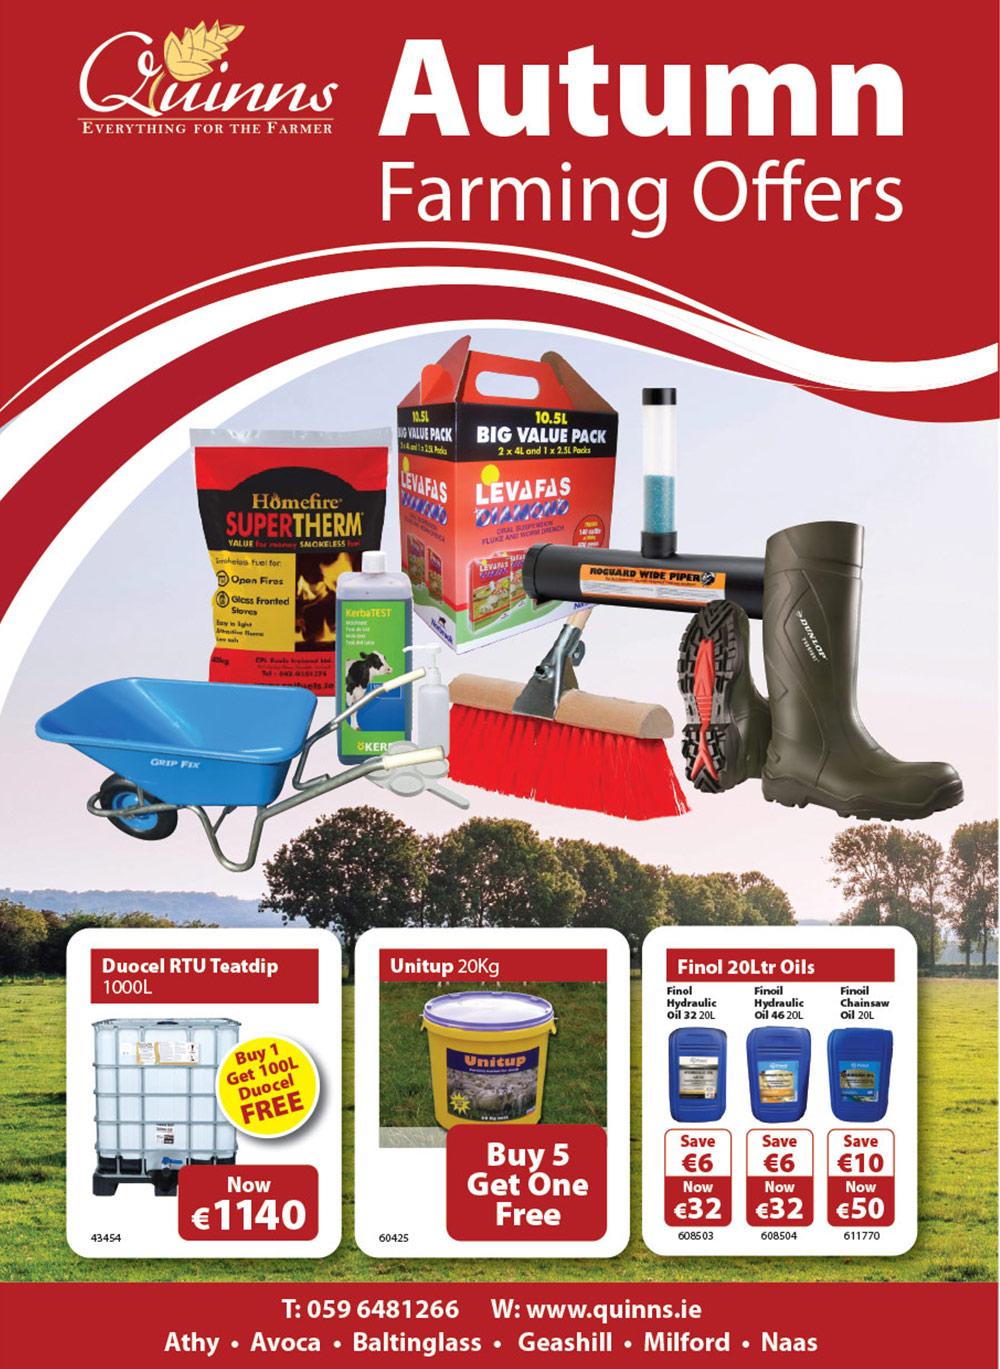 Quinns Autumn Farming Offers